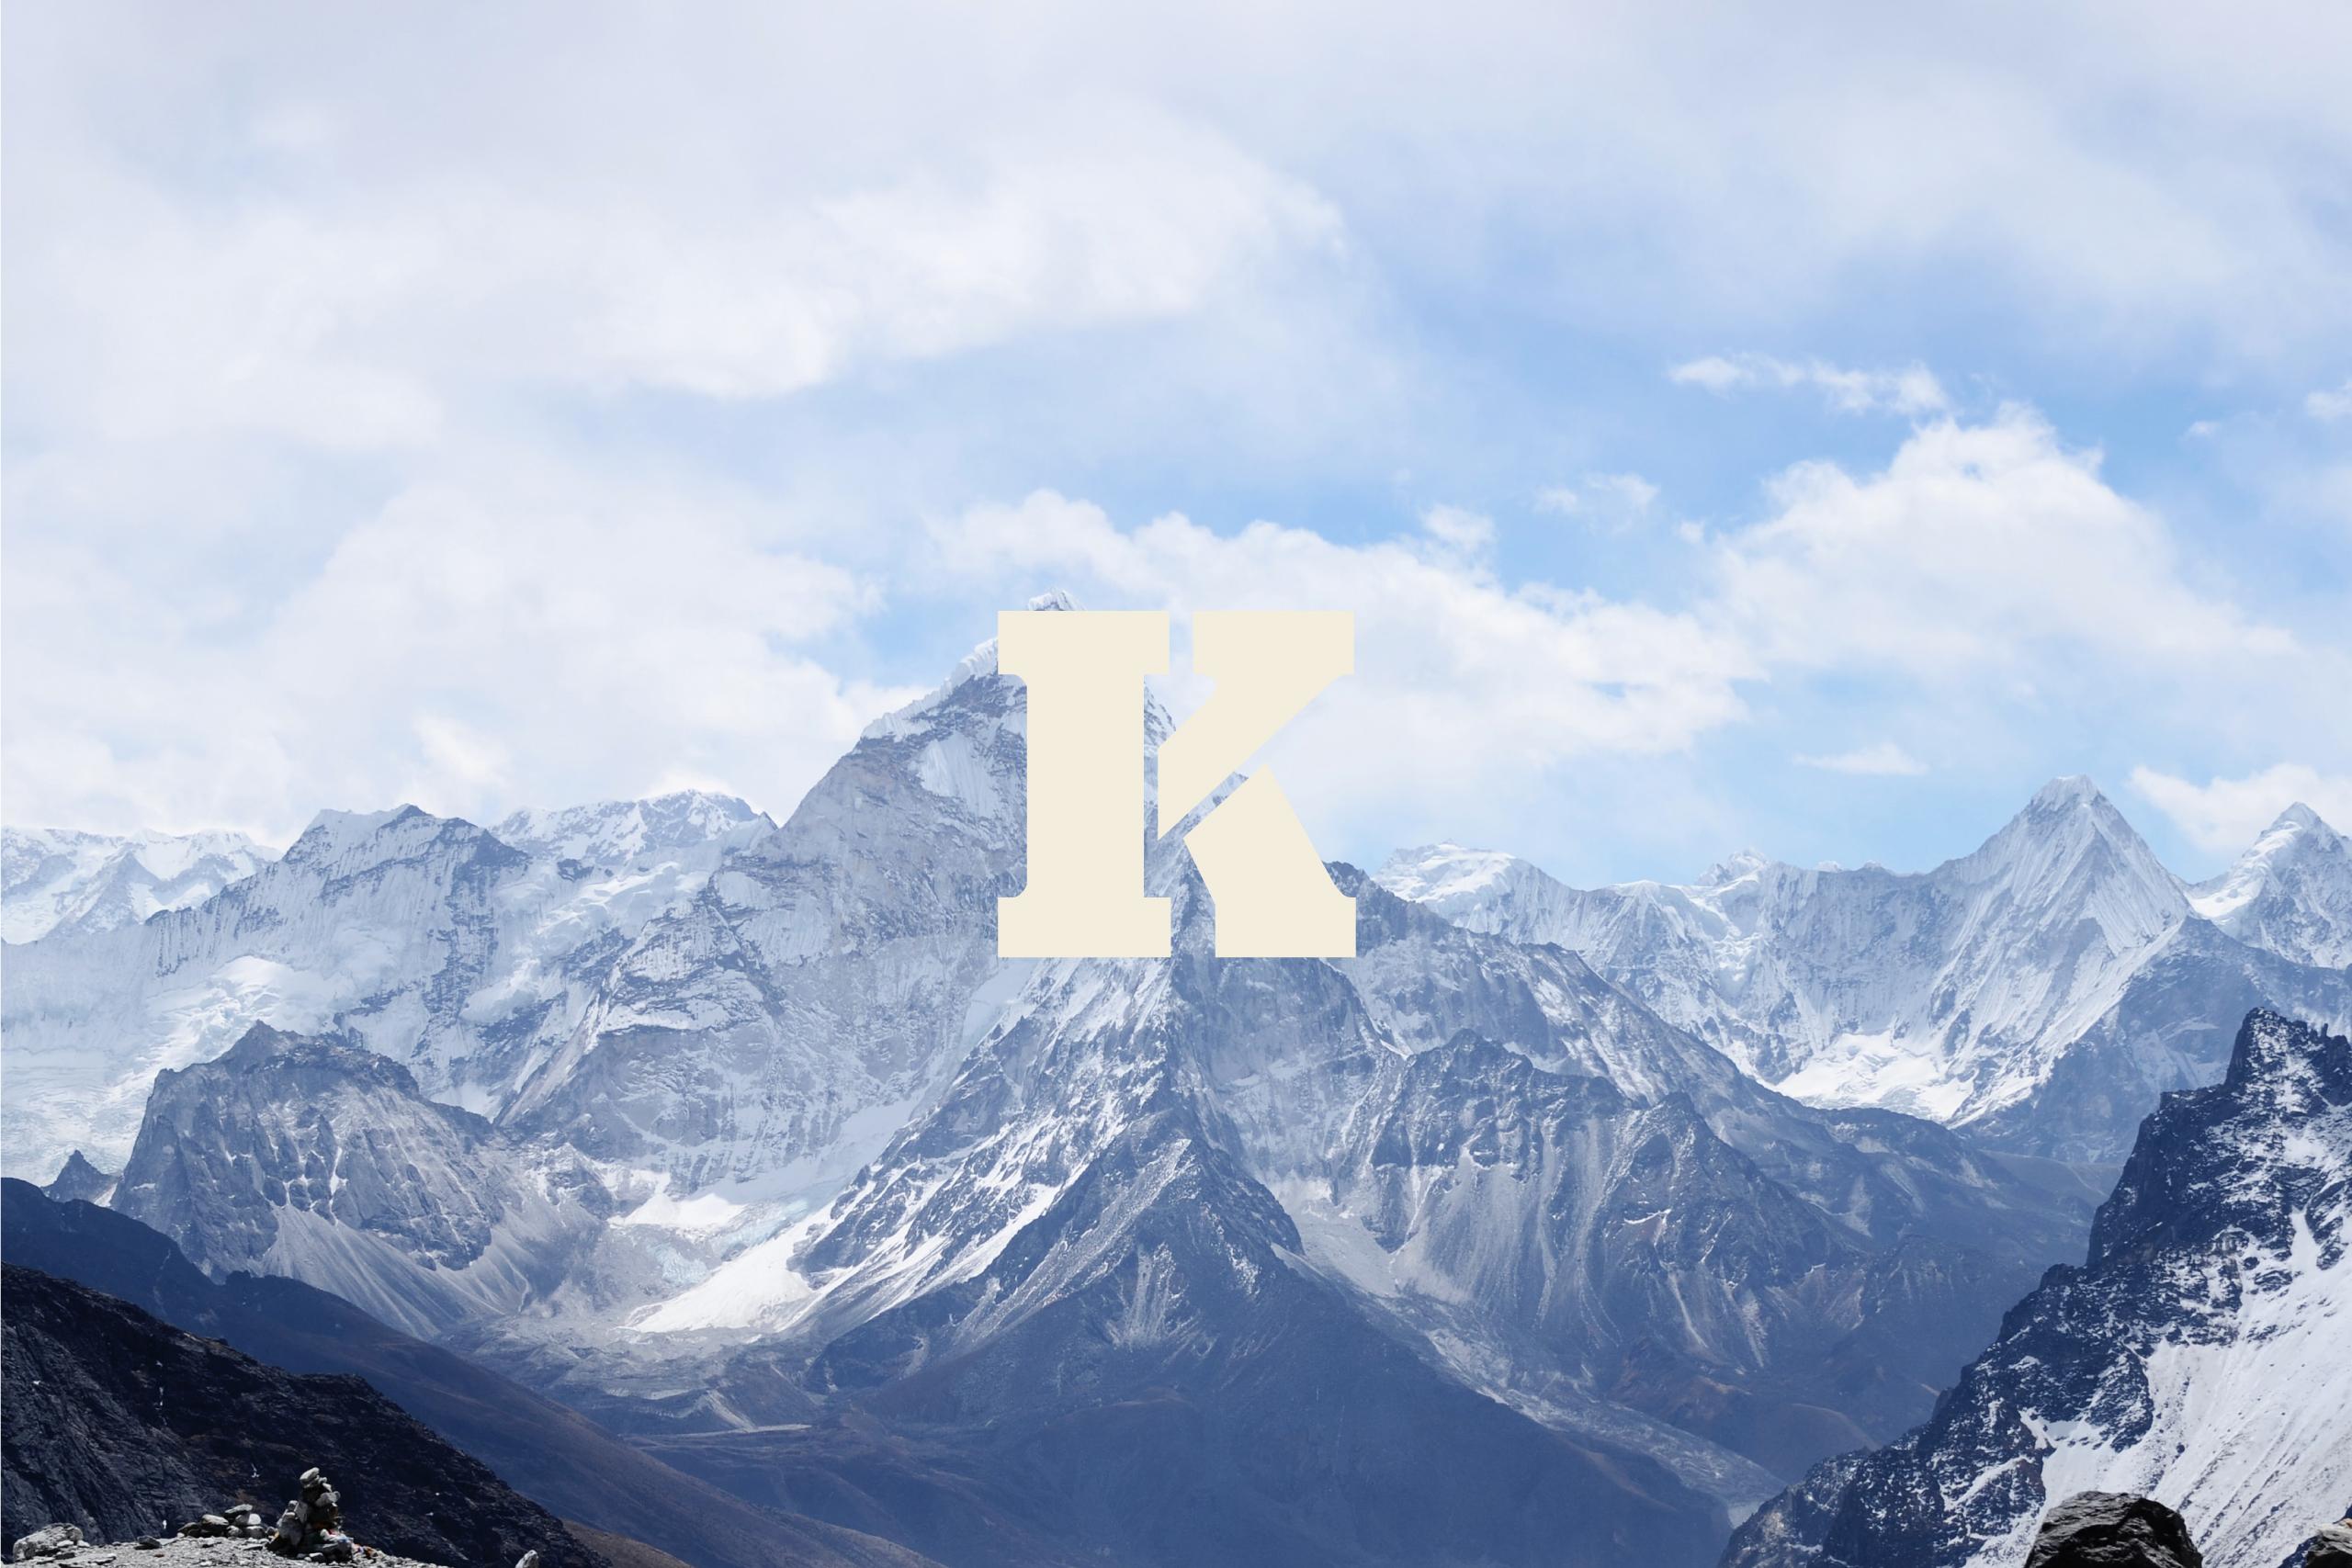 → Rai tre / Kilimangiaro